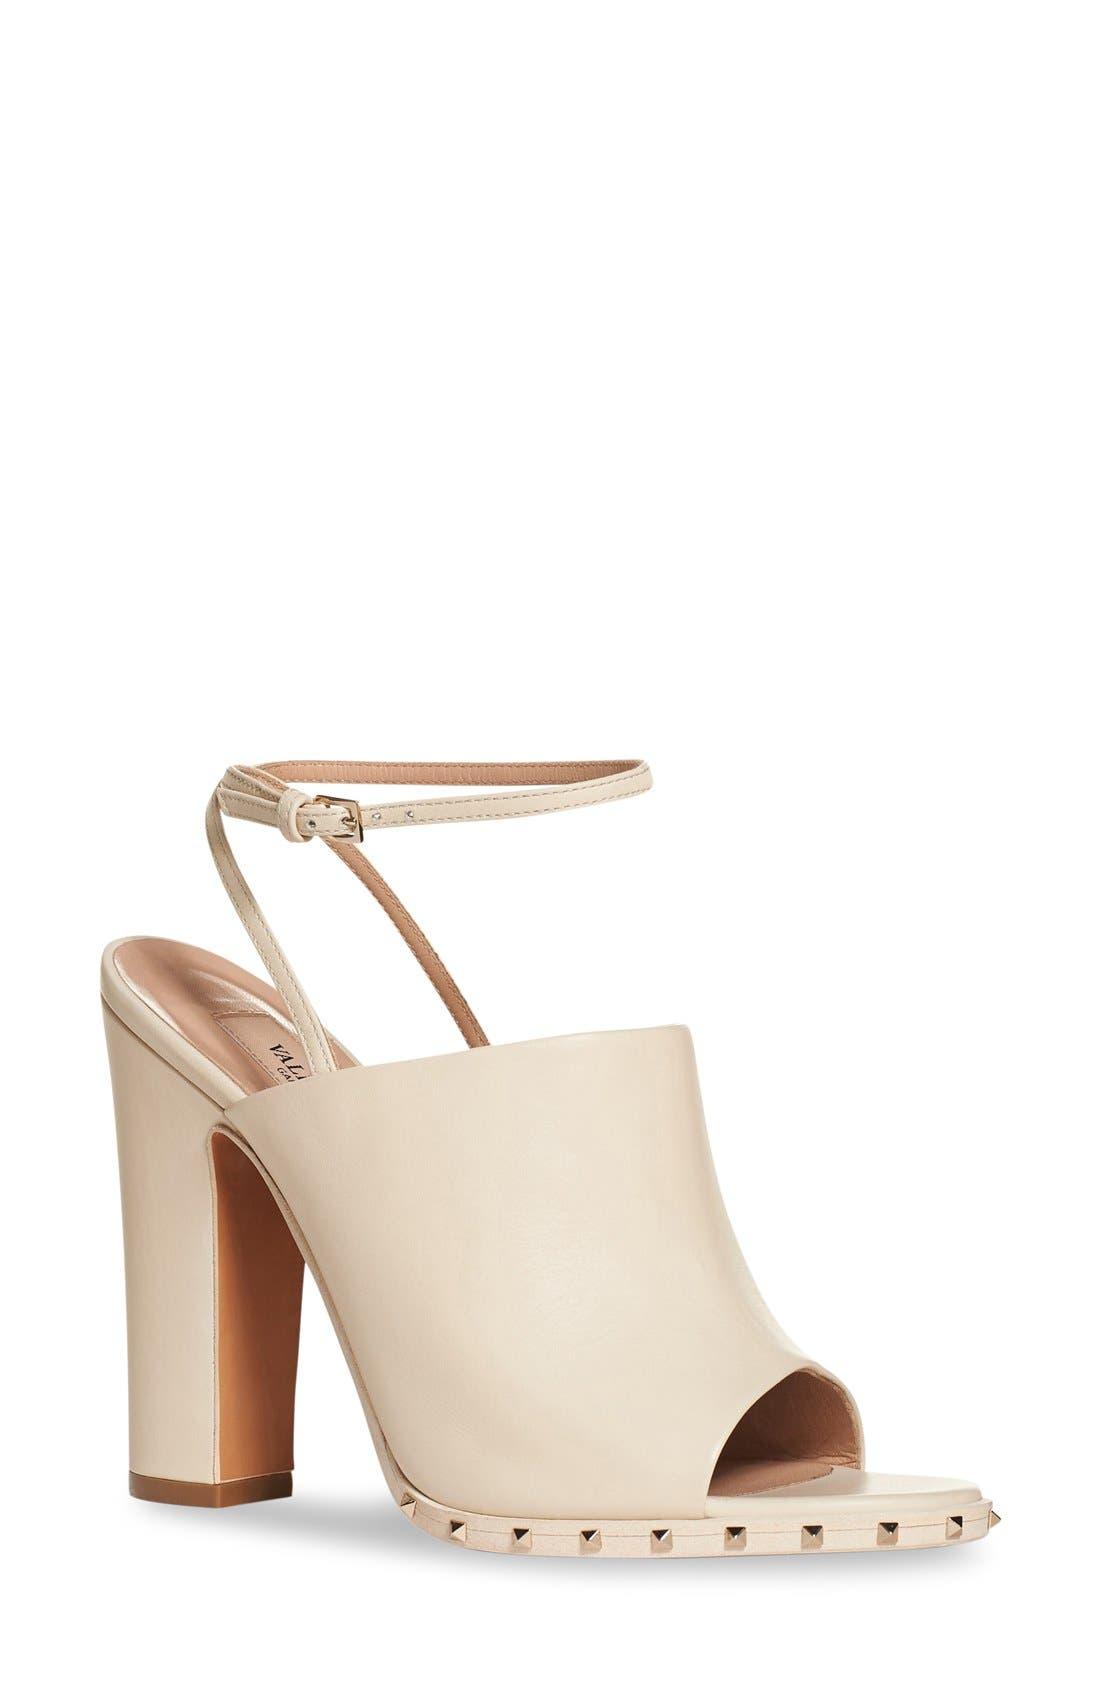 'Soul Stud' Peep Toe Sandal,                             Main thumbnail 1, color,                             Ivory Leather